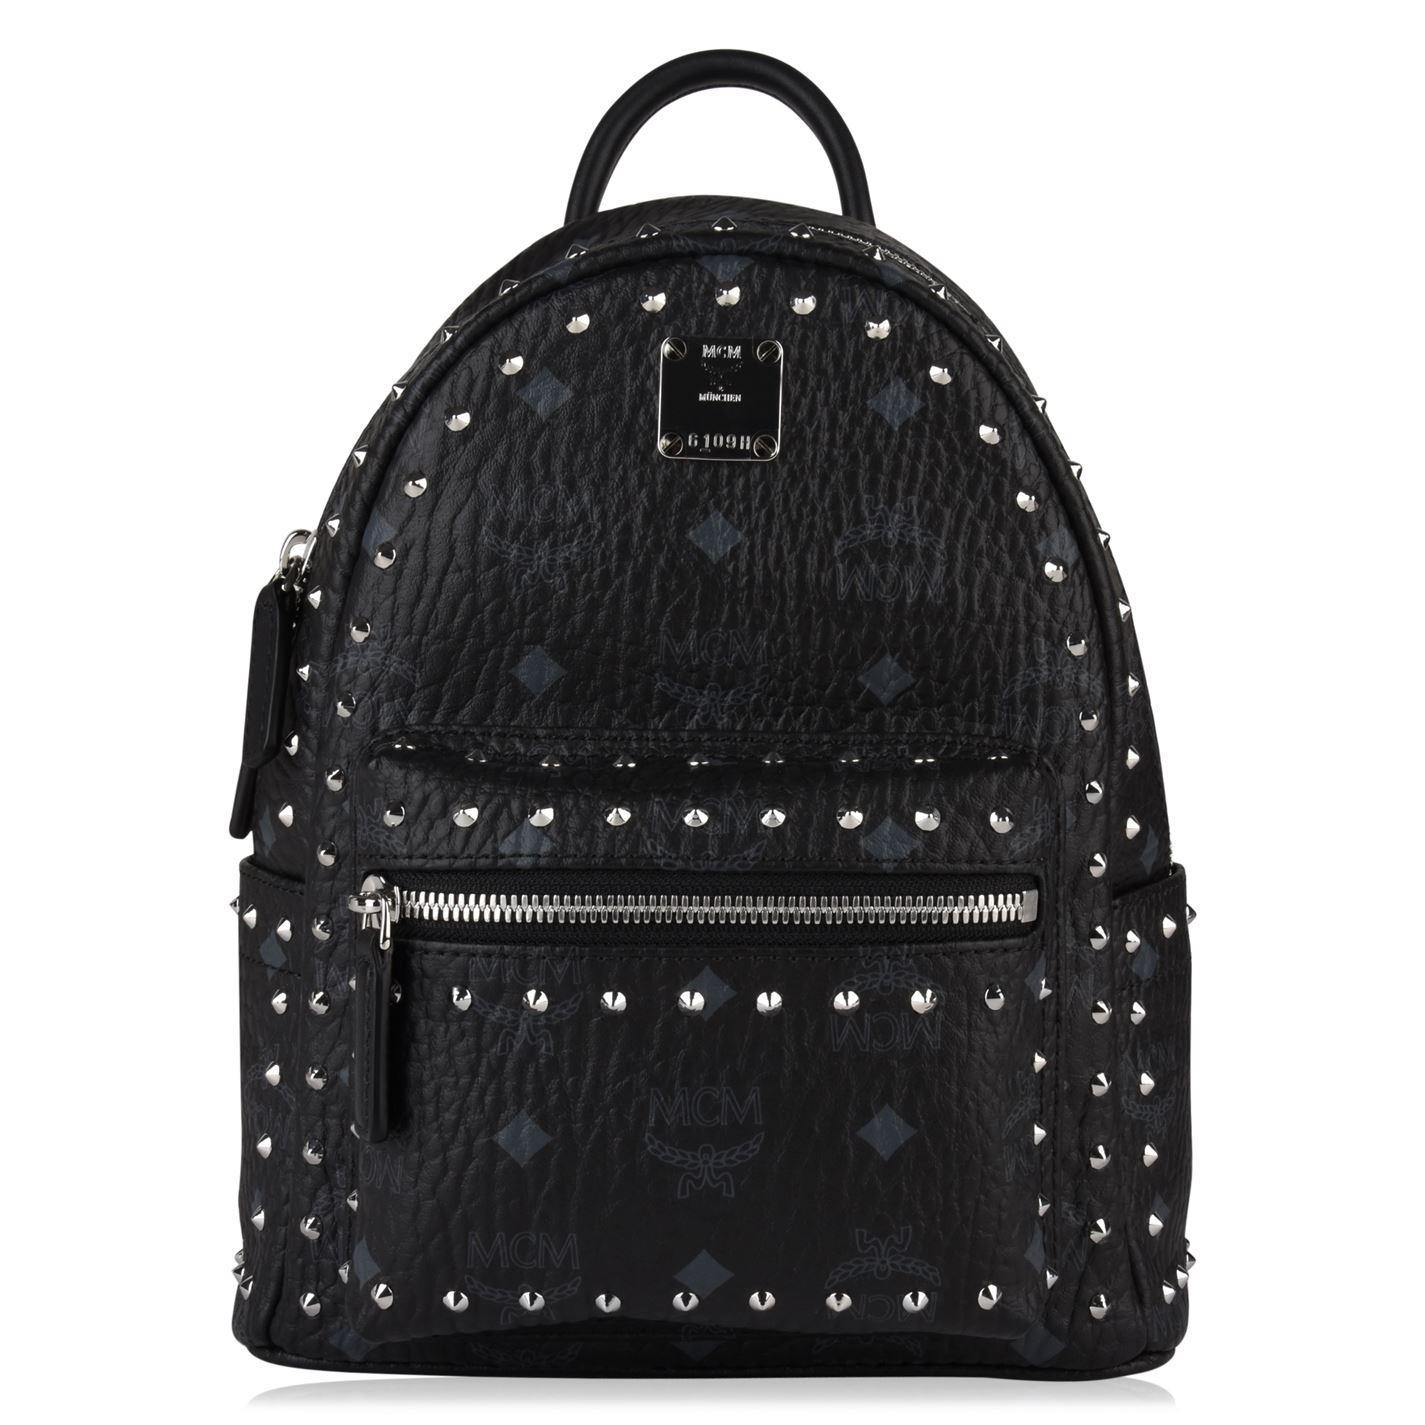 a3c2f676d40 MCM Stark Mini Backpack in Black - Save 19% - Lyst